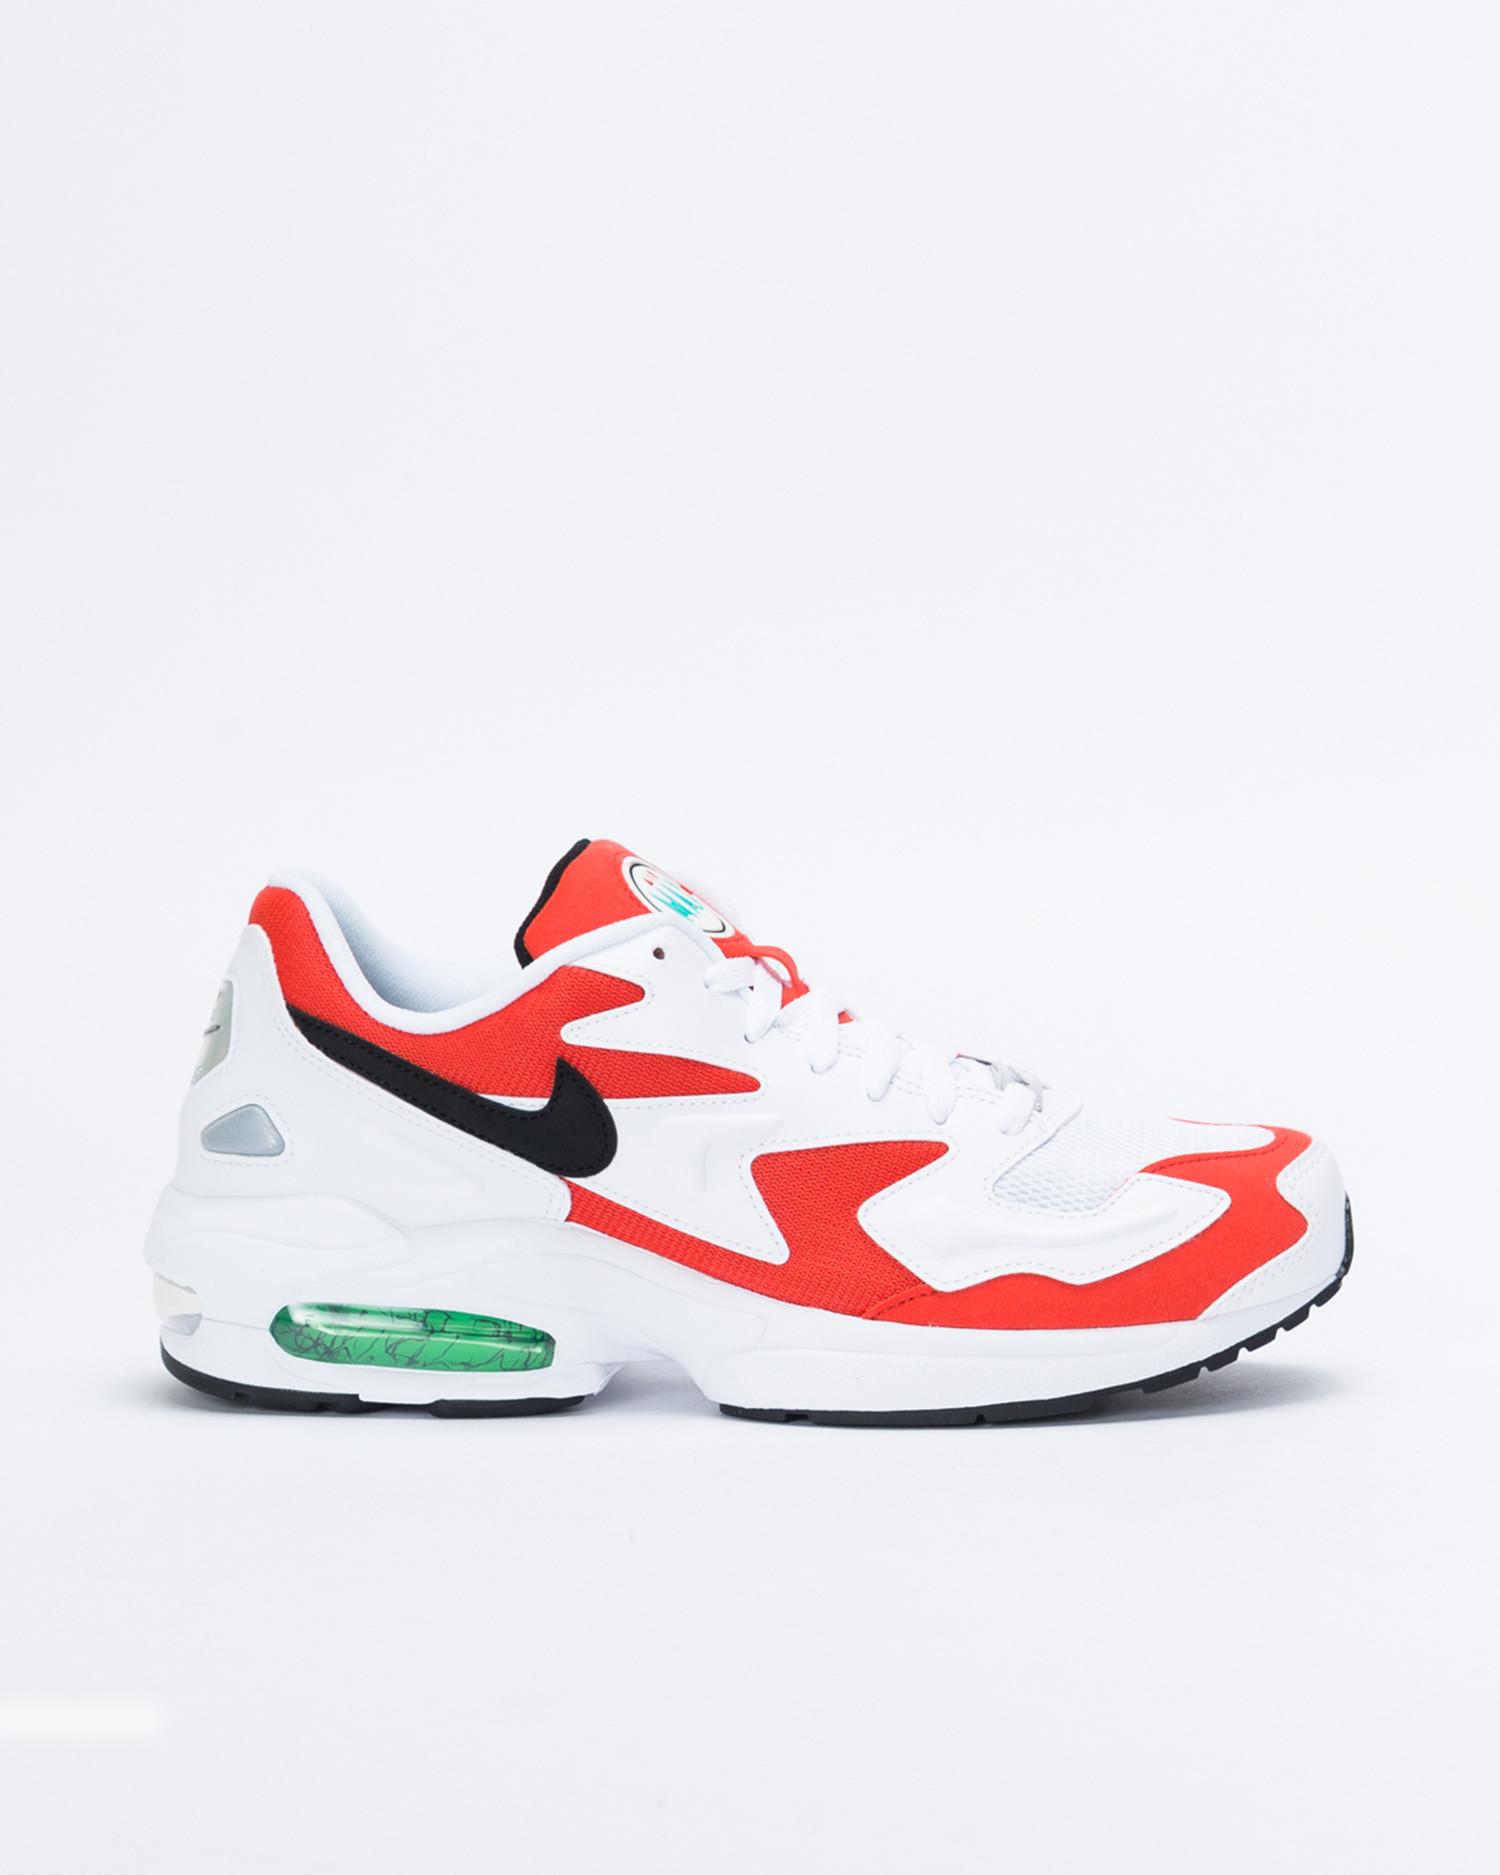 Nike Air Max 2 Light Whiteblack habanero red cool grey